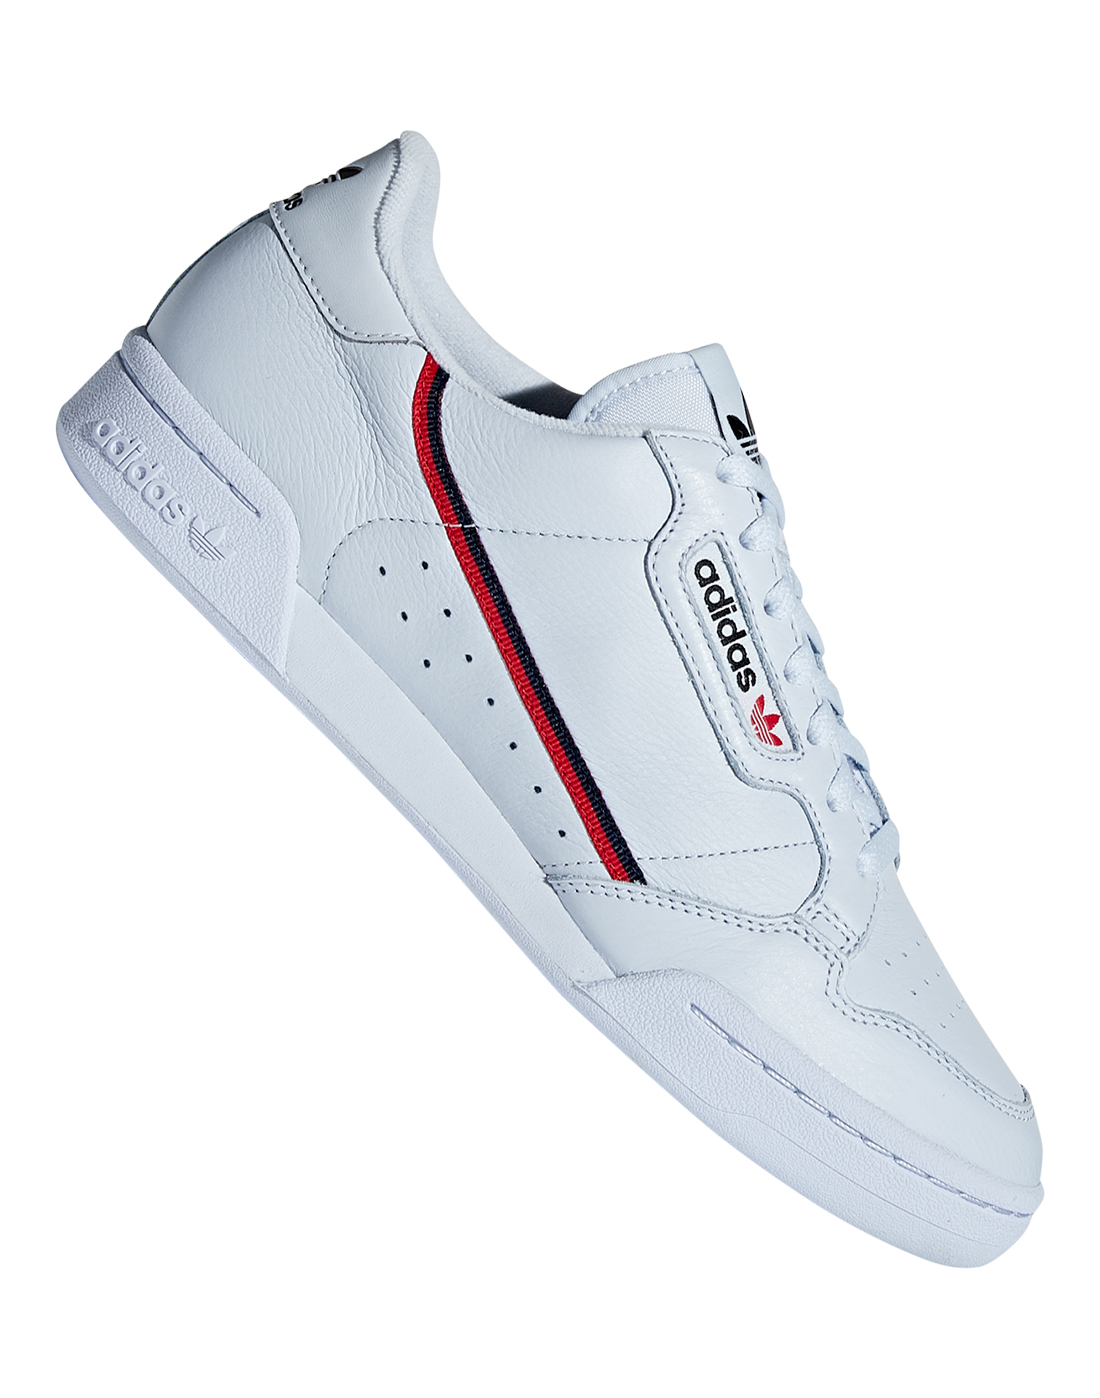 28cb14a71790 Men s Light Blue adidas Originals Continental 80